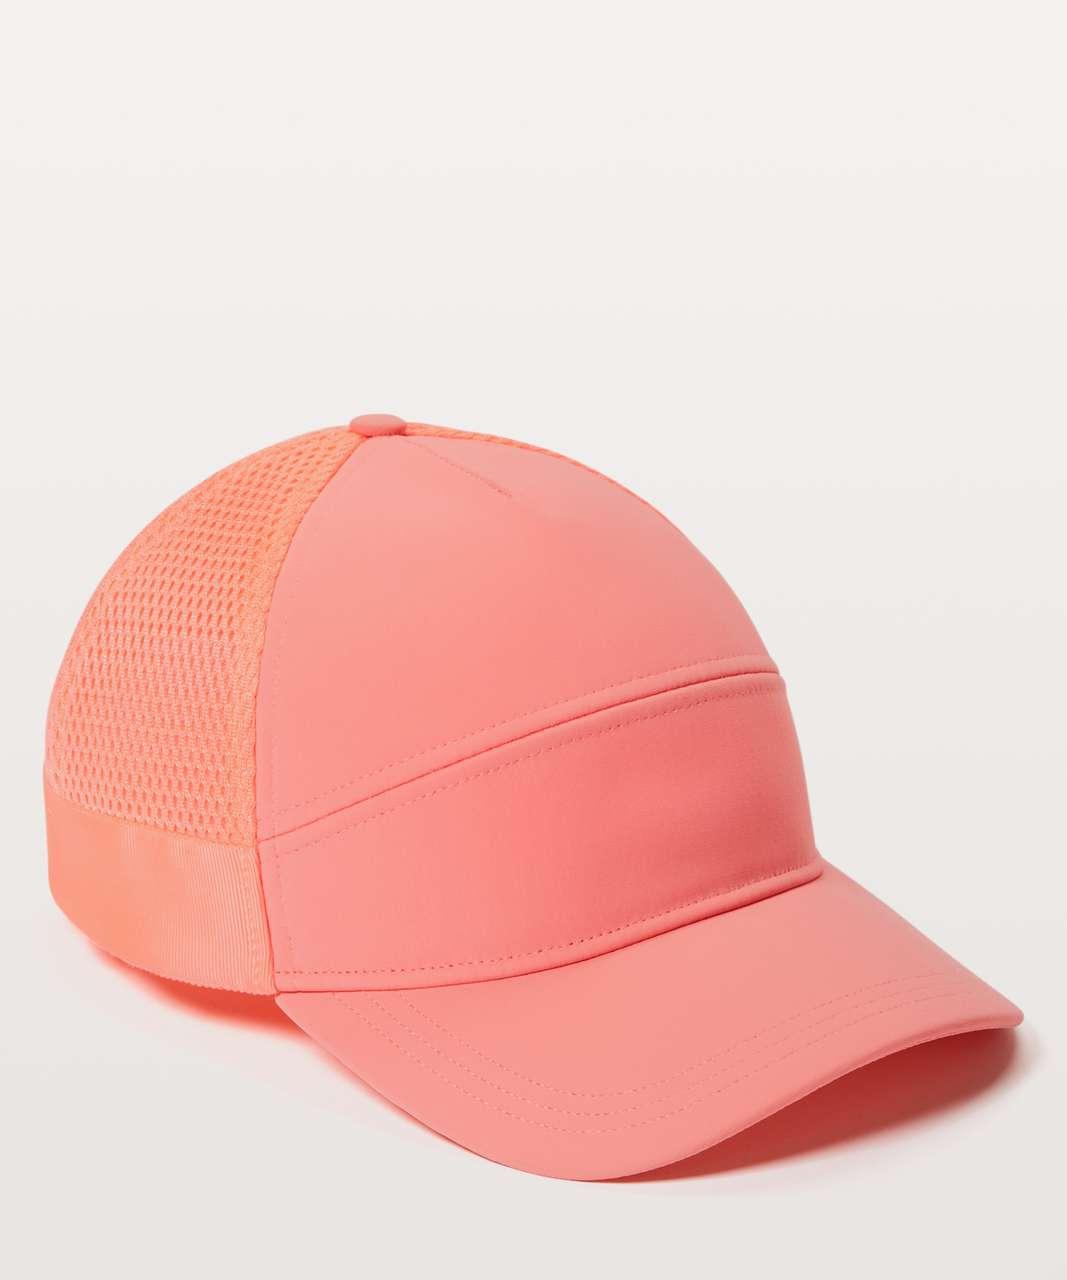 Lululemon Dash & Splash Cap II - Light Coral / Sunset